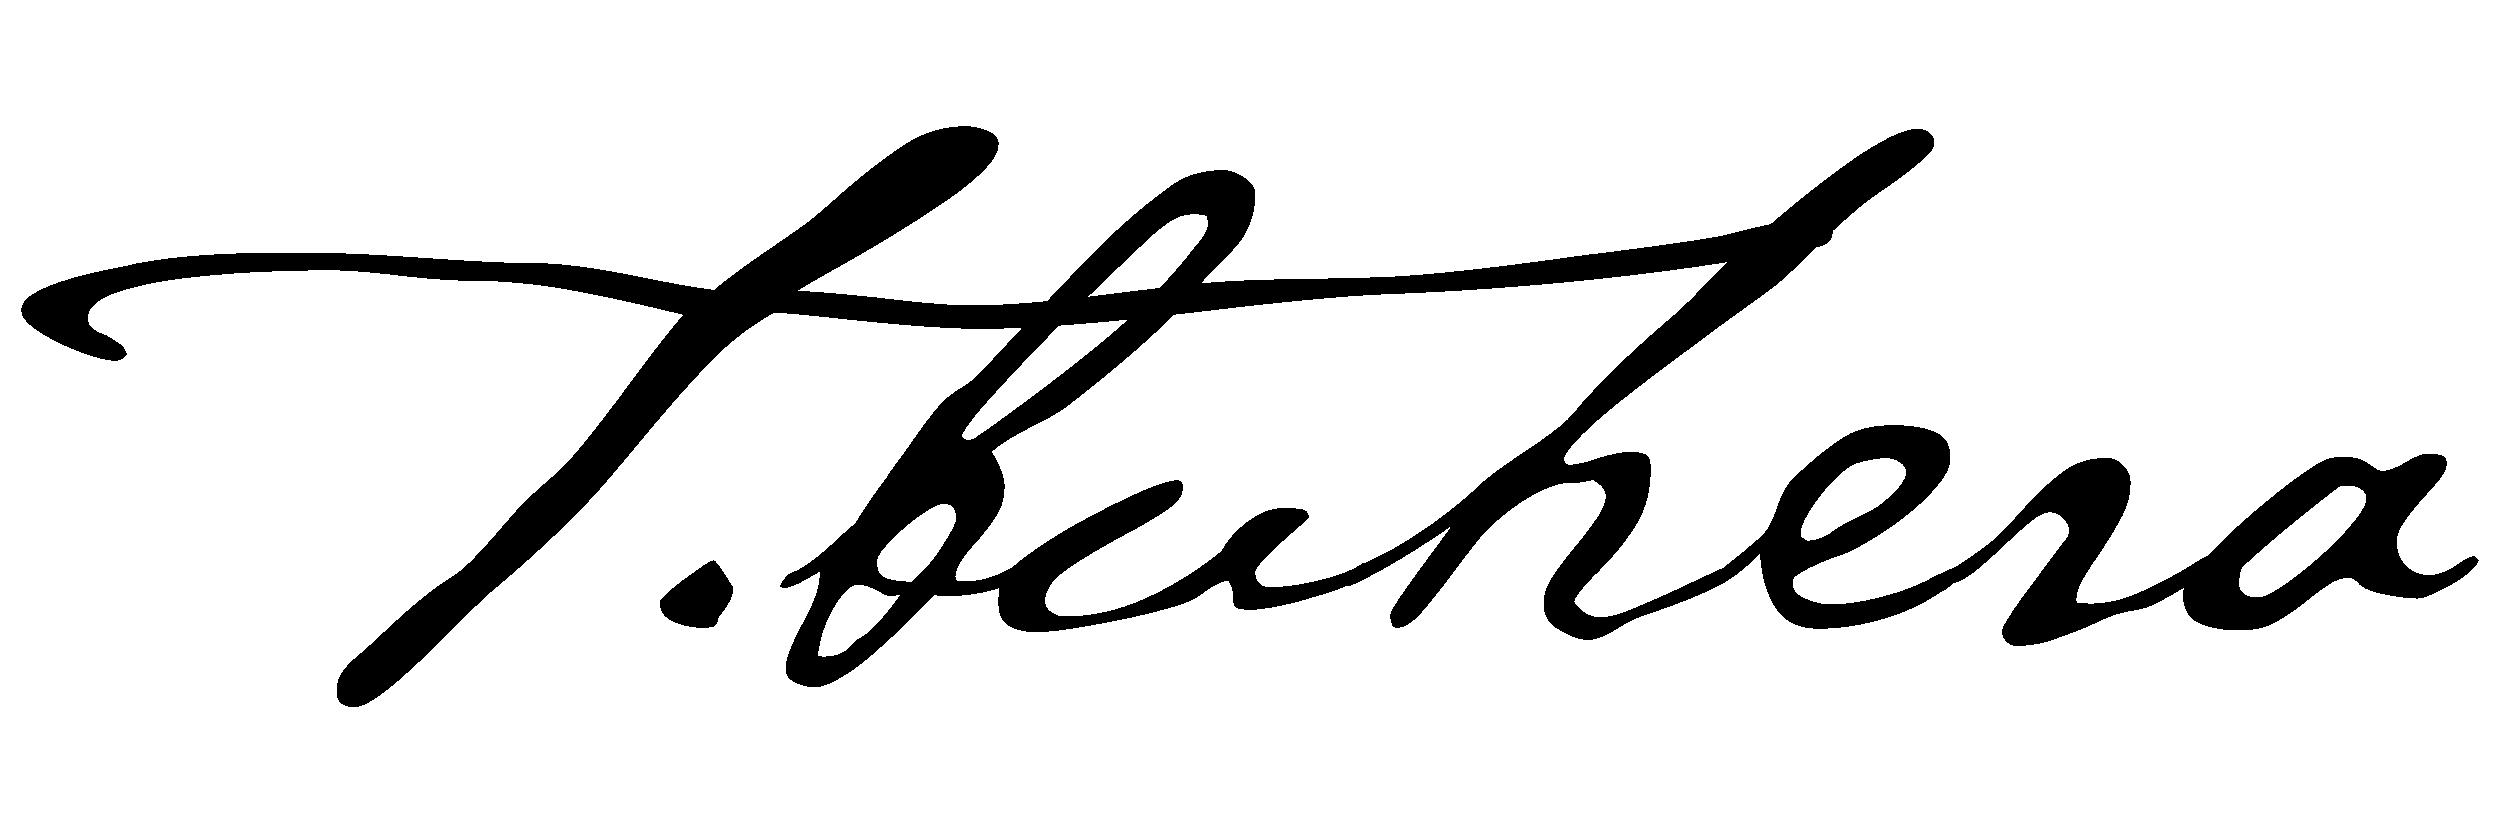 Tatenda Buhera Signature